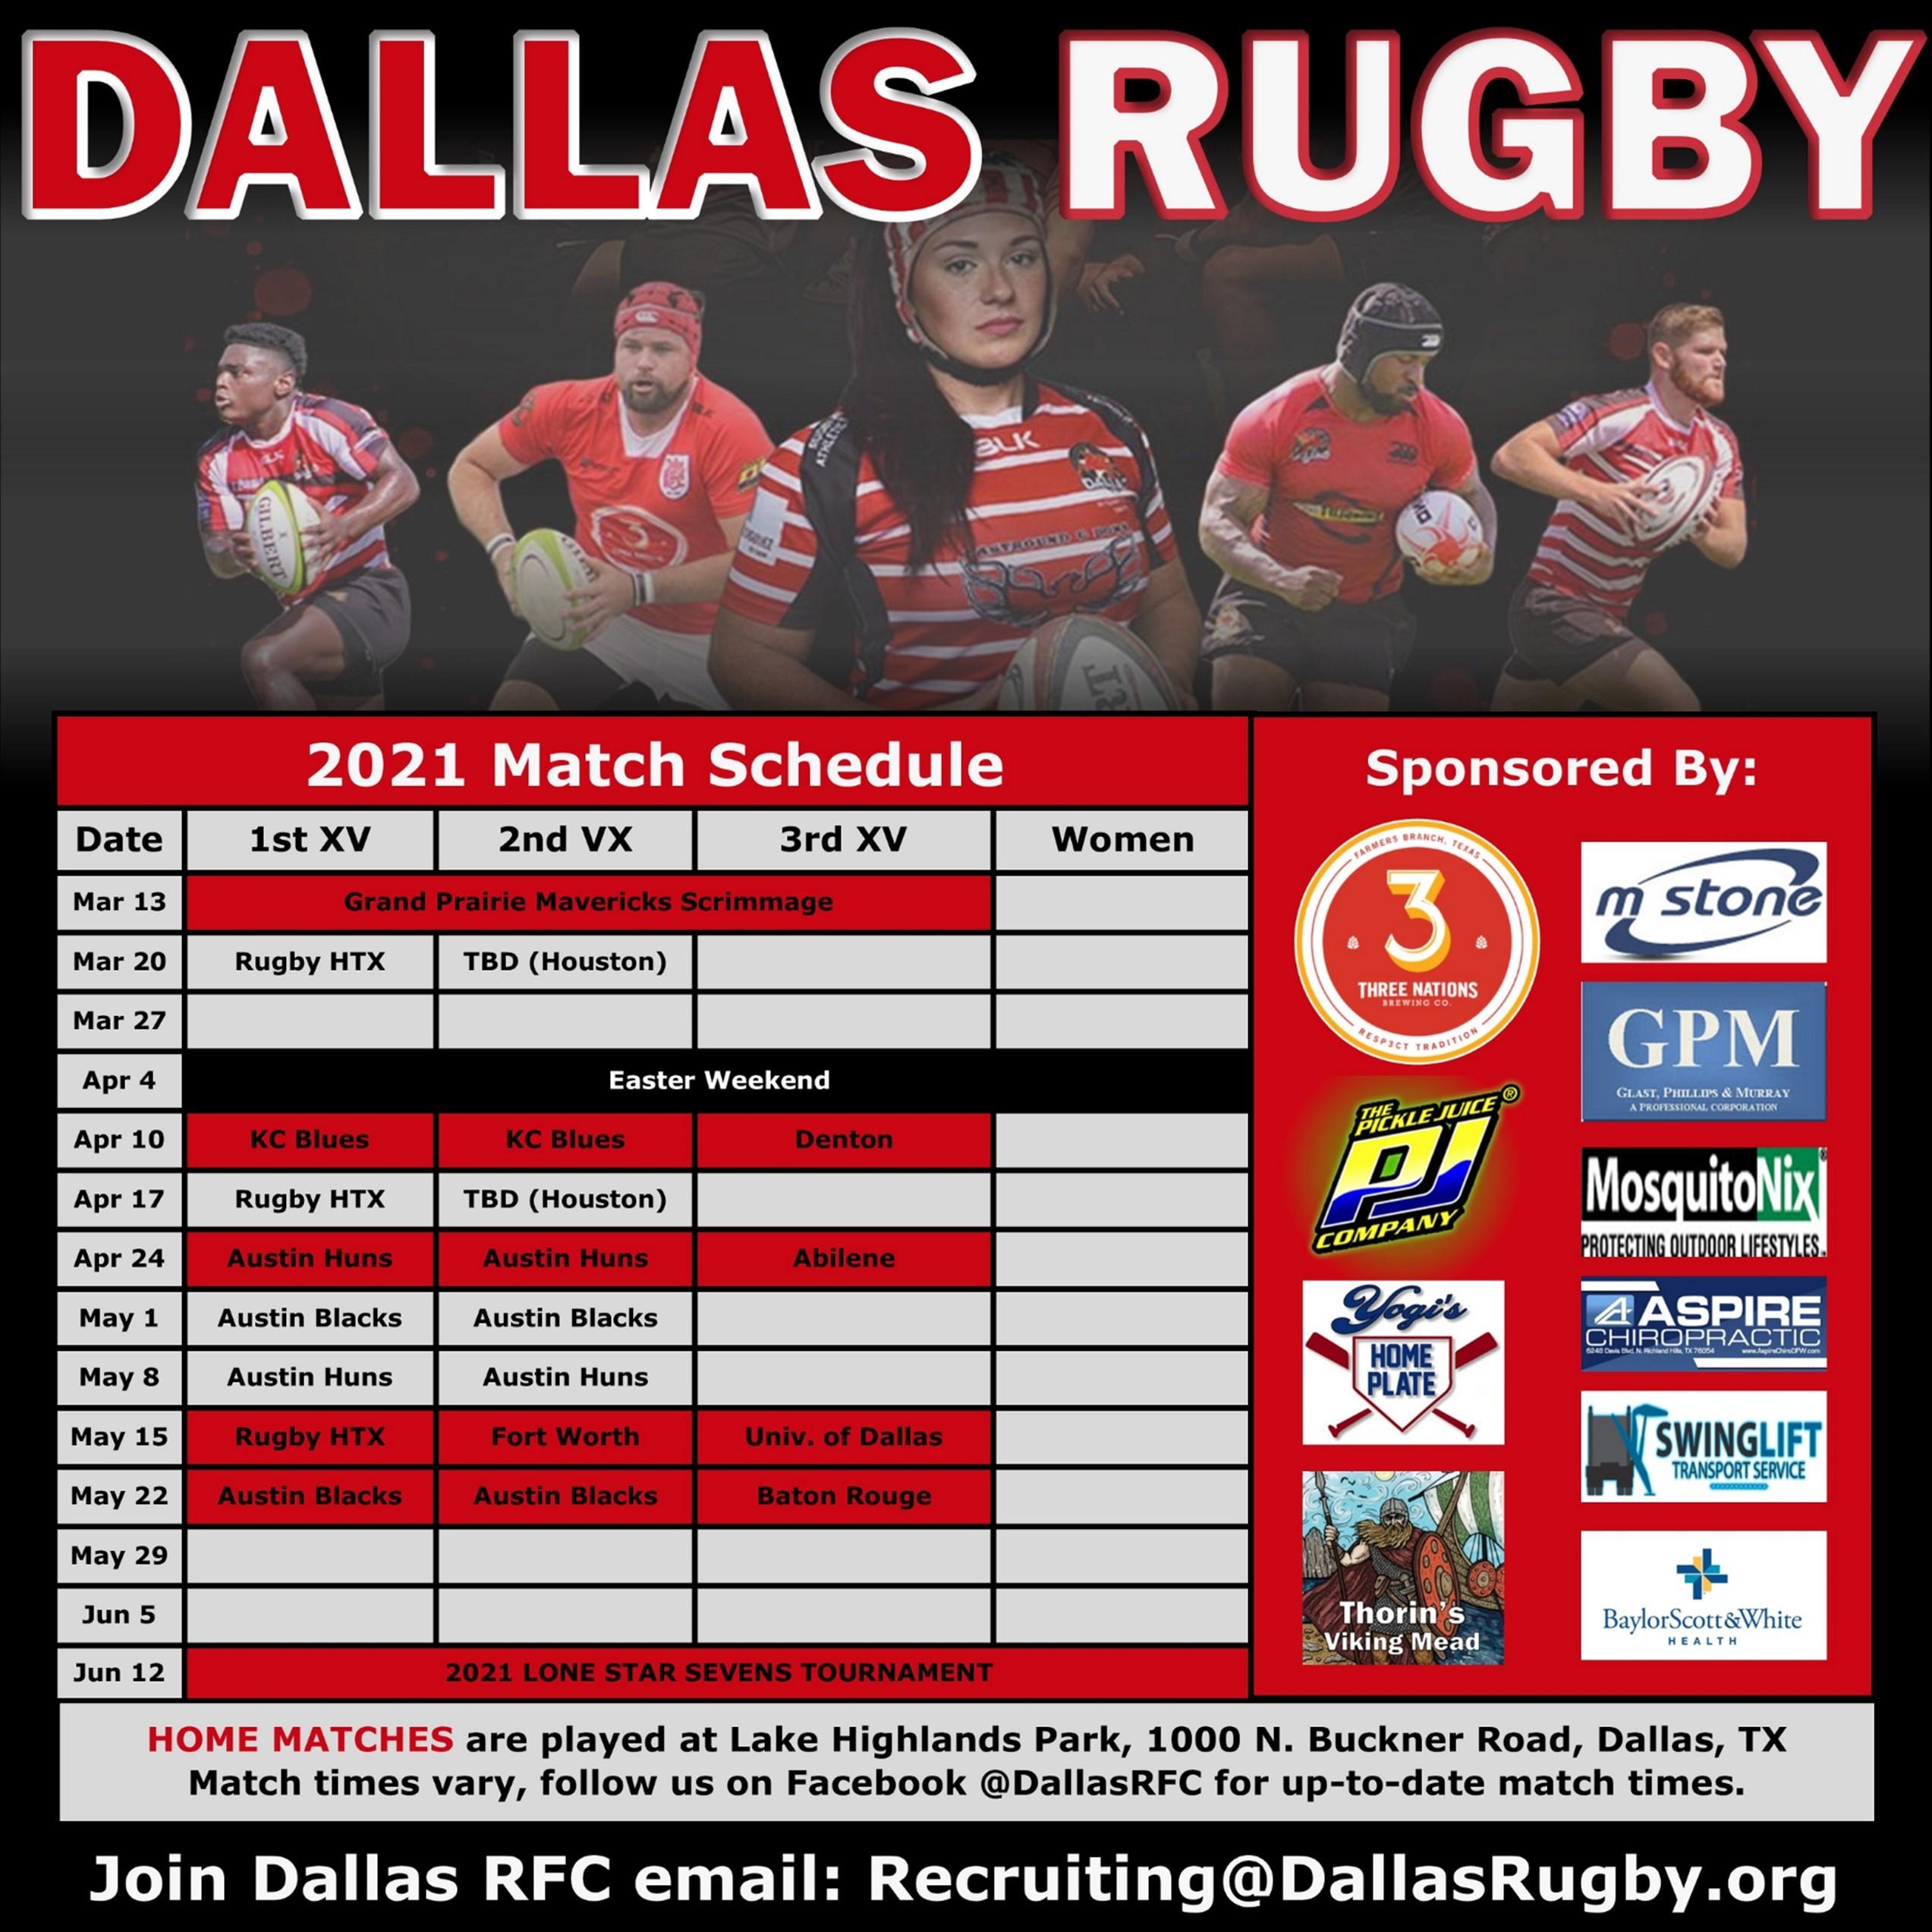 Dallas Rugby's 2021 Schedule